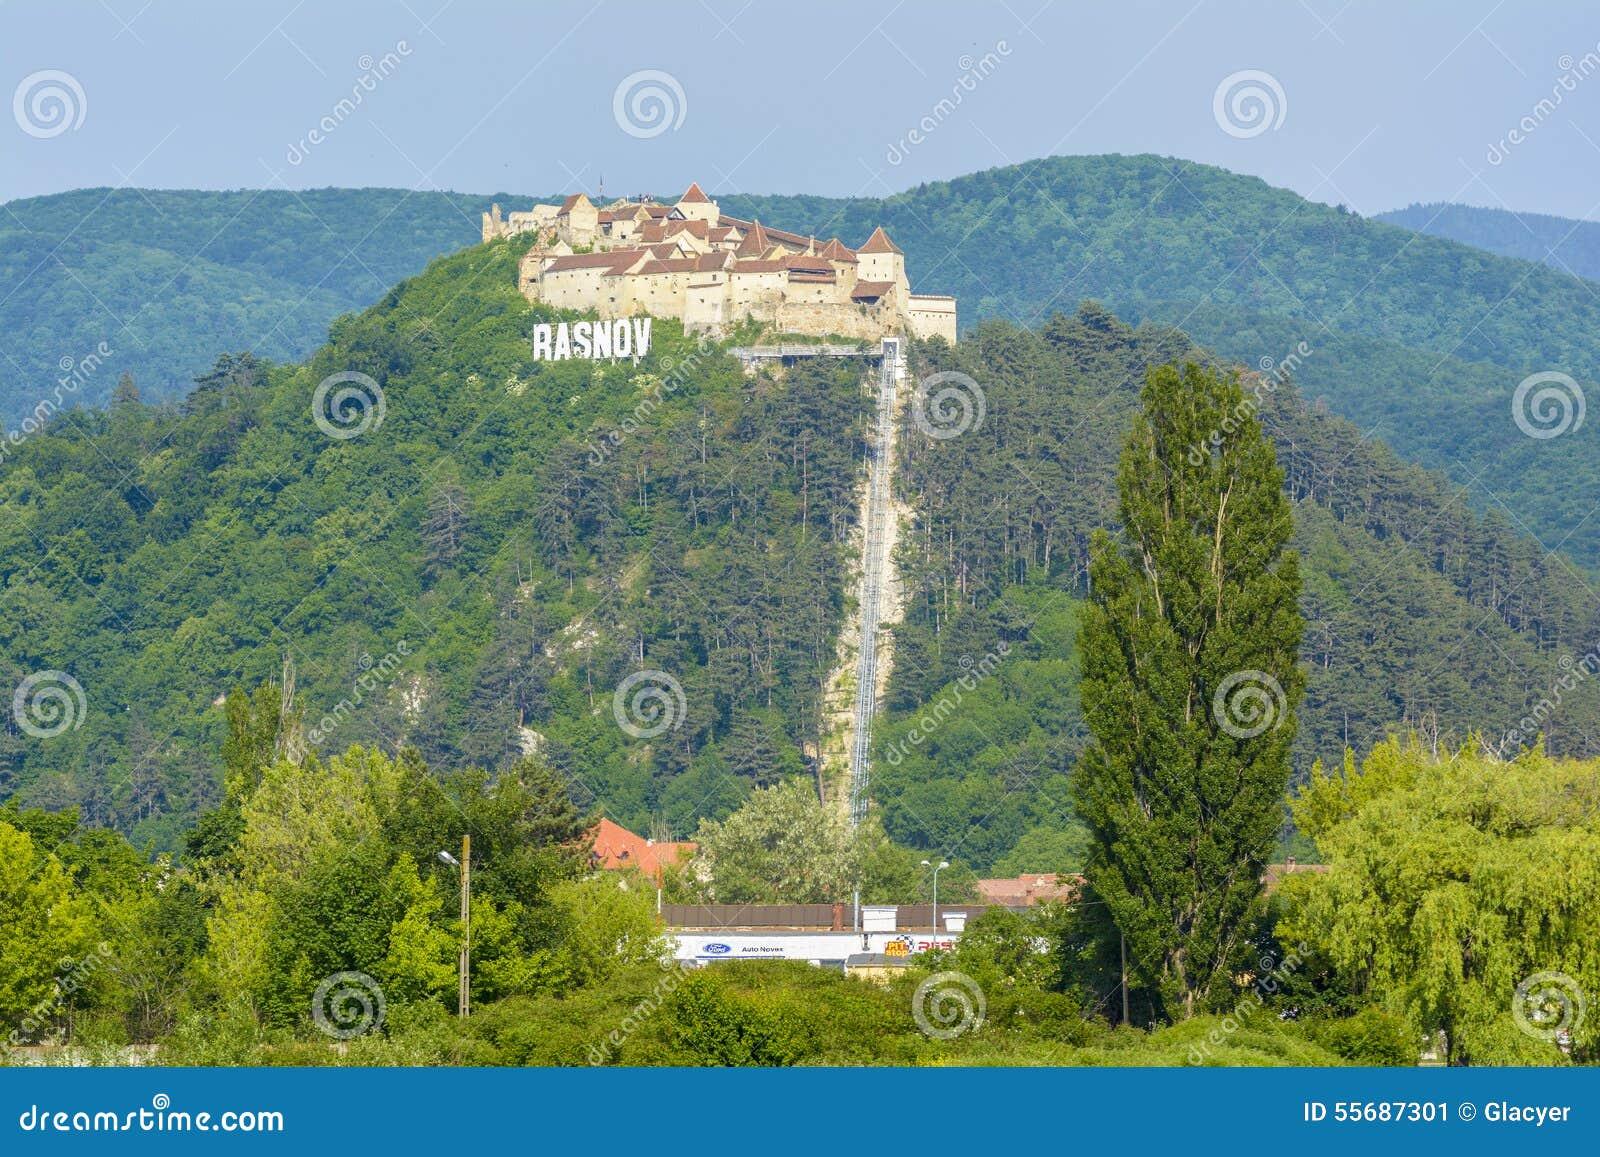 Forteresse de Rasnov, la Transylvanie Roumanie